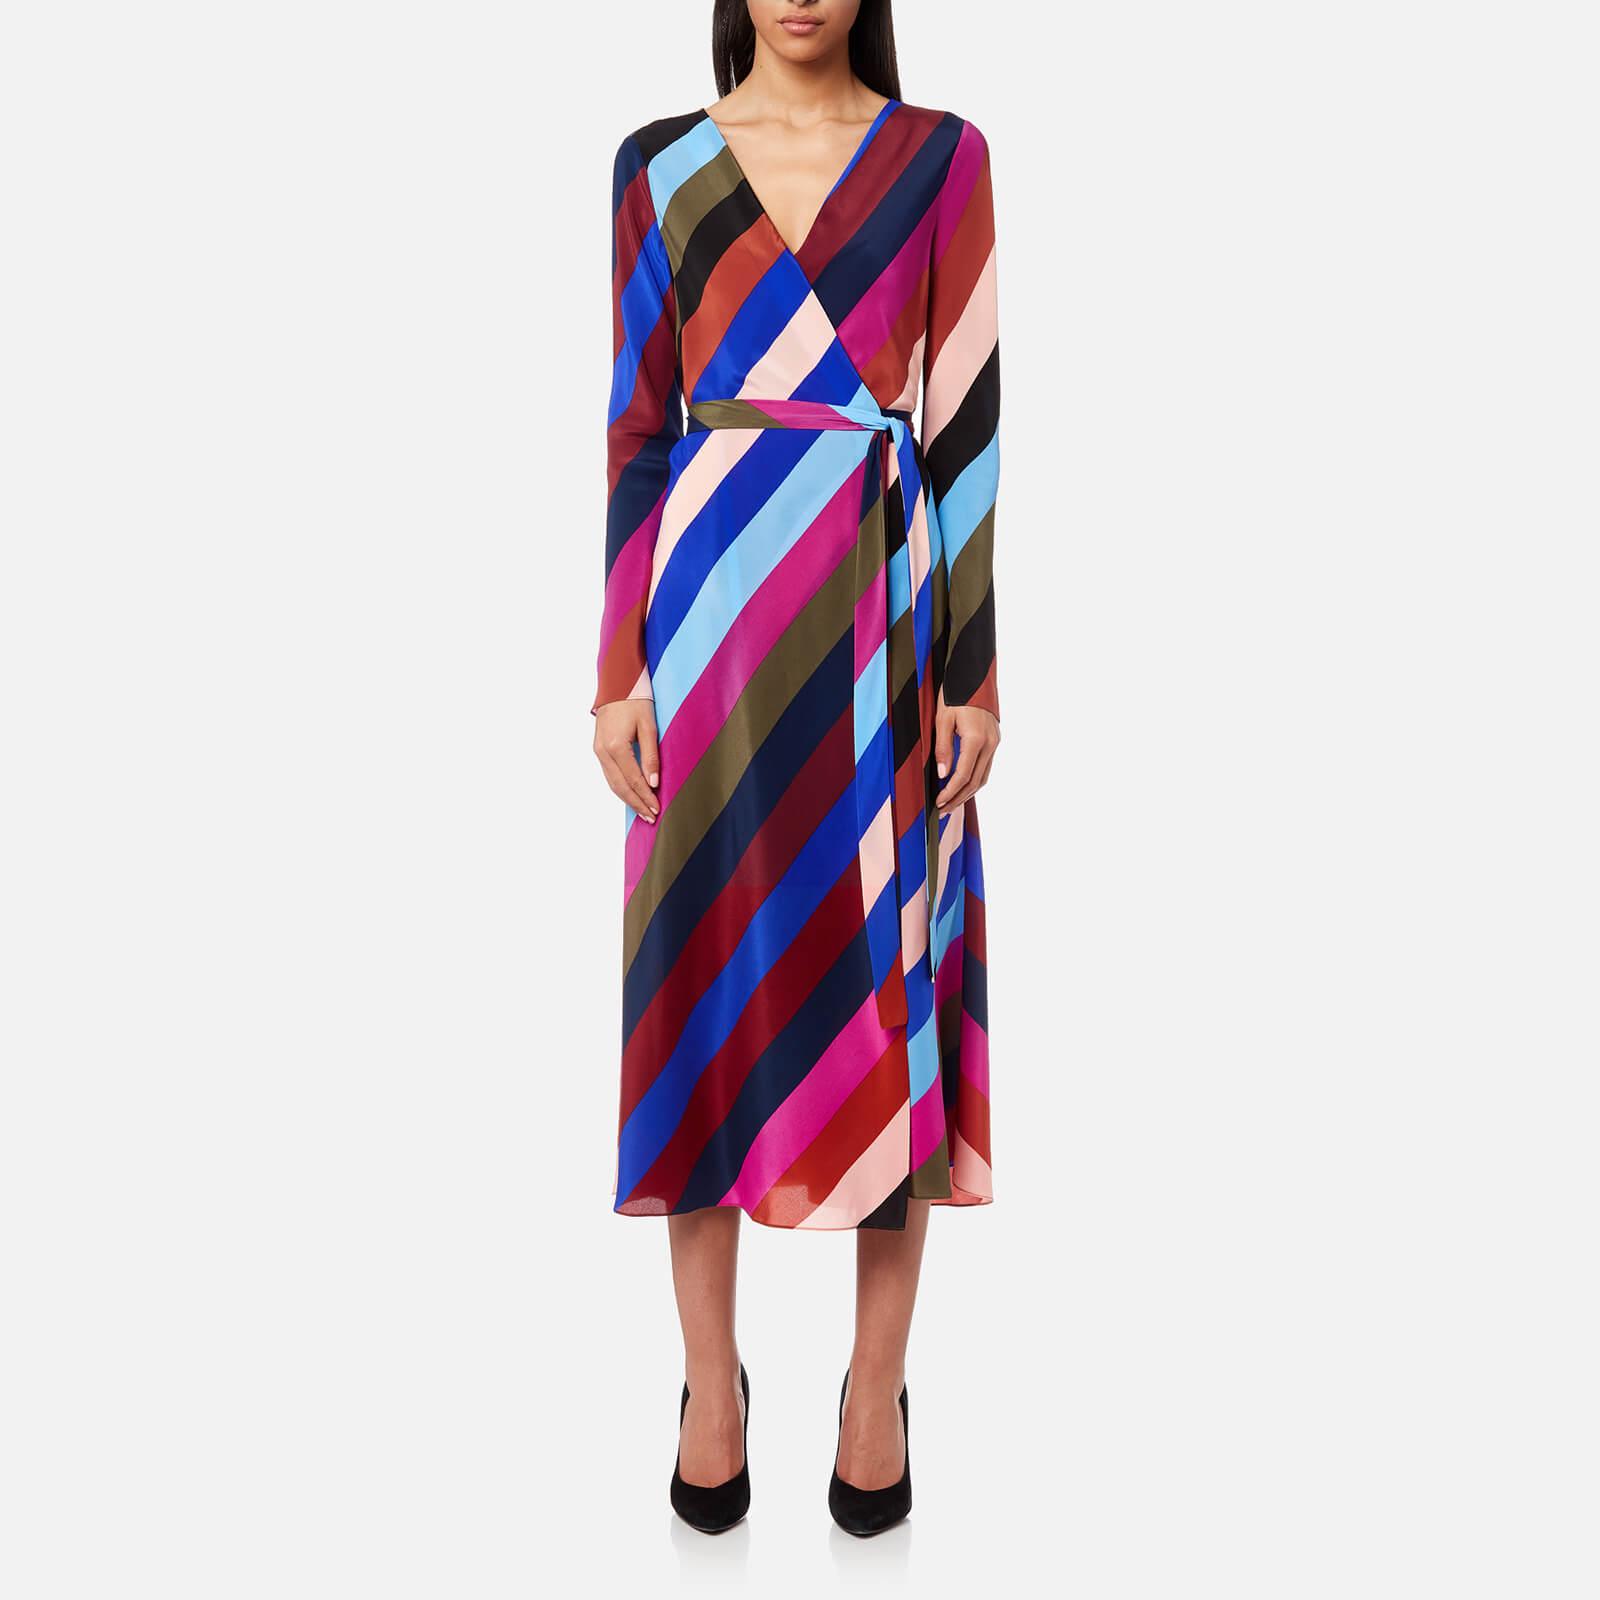 898d75a44a Diane von Furstenberg Women's Midi Woven Wrap Dress - Carson Stripe Black/ Multi - Free UK Delivery over £50